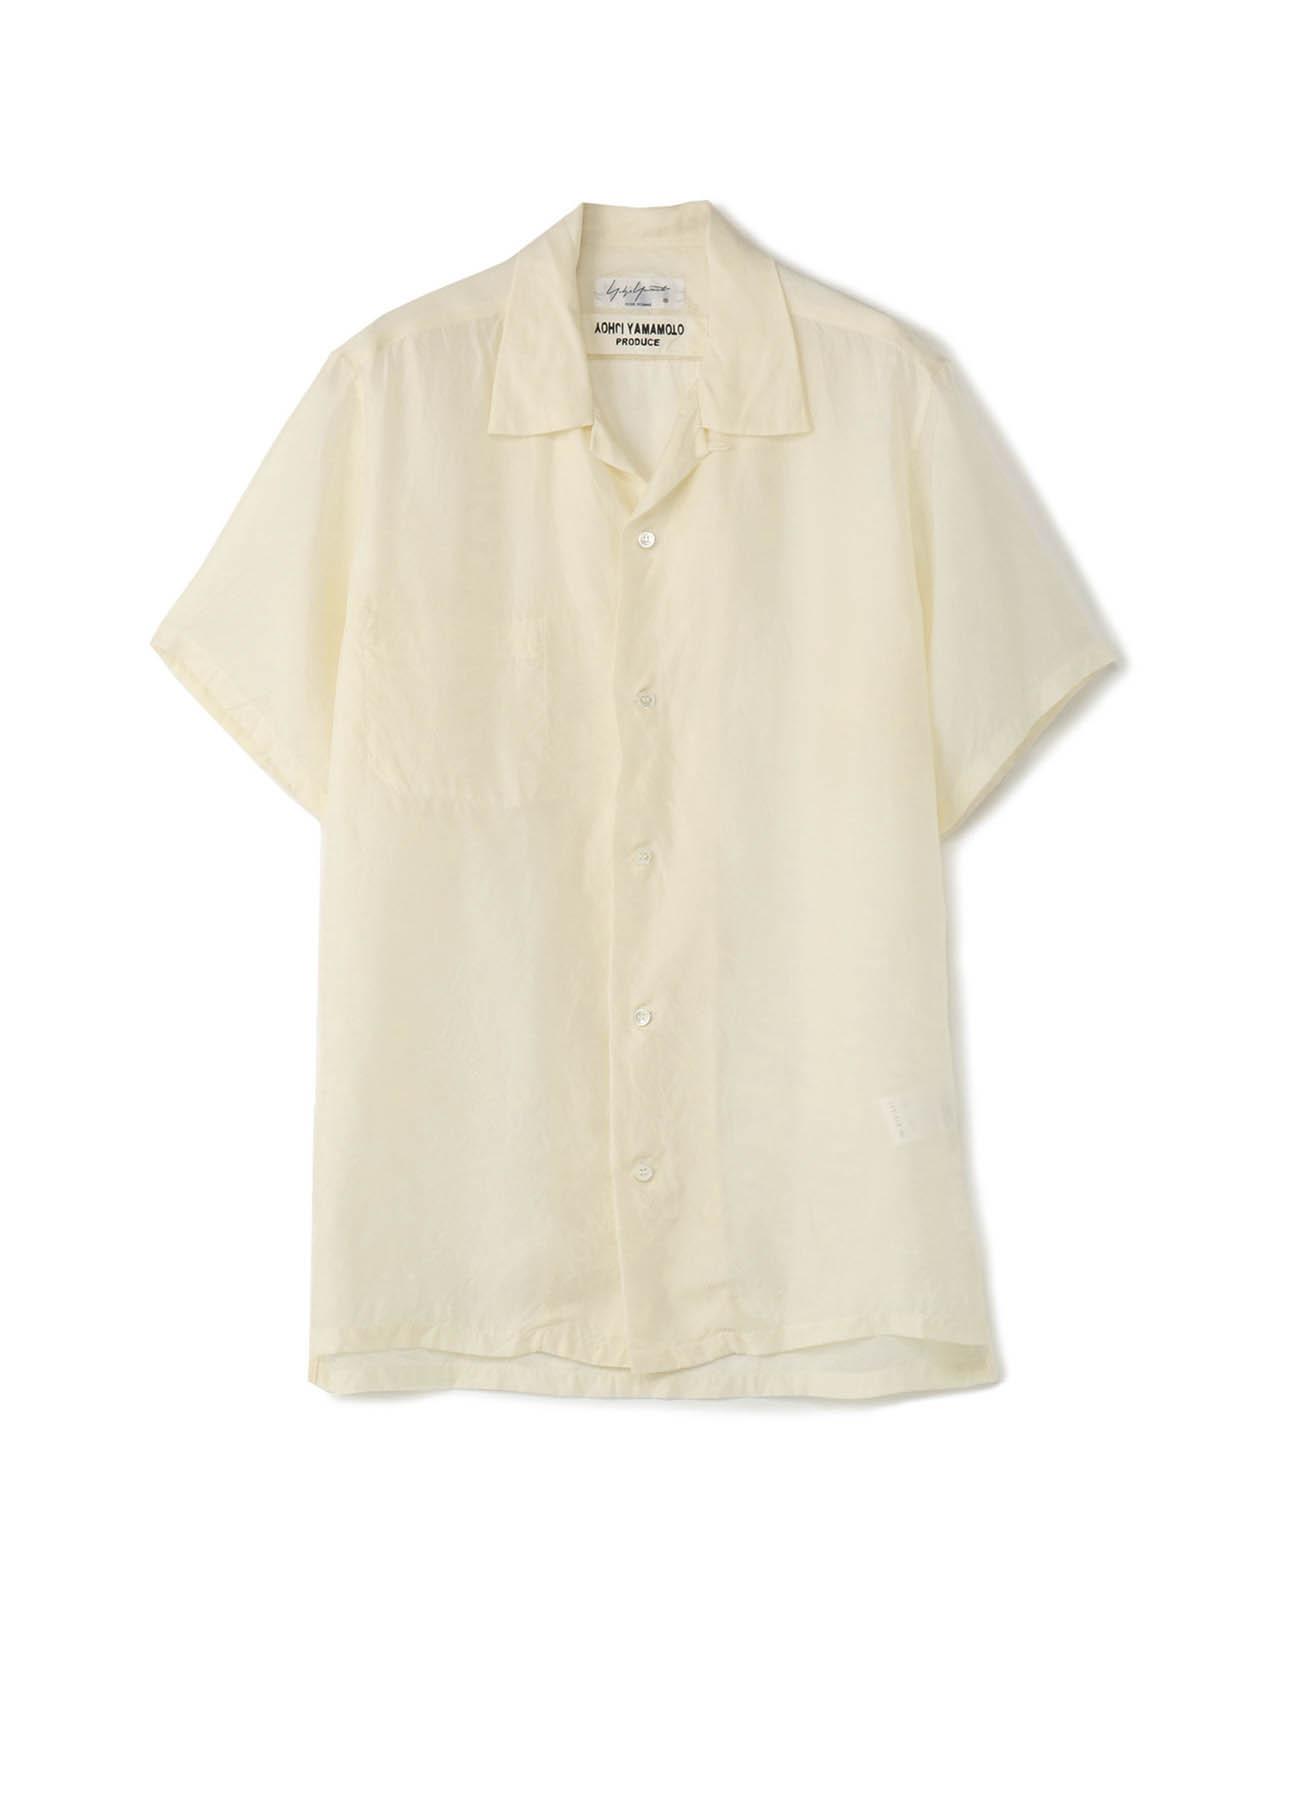 【THE SHOP限定】 キュプラシャツ